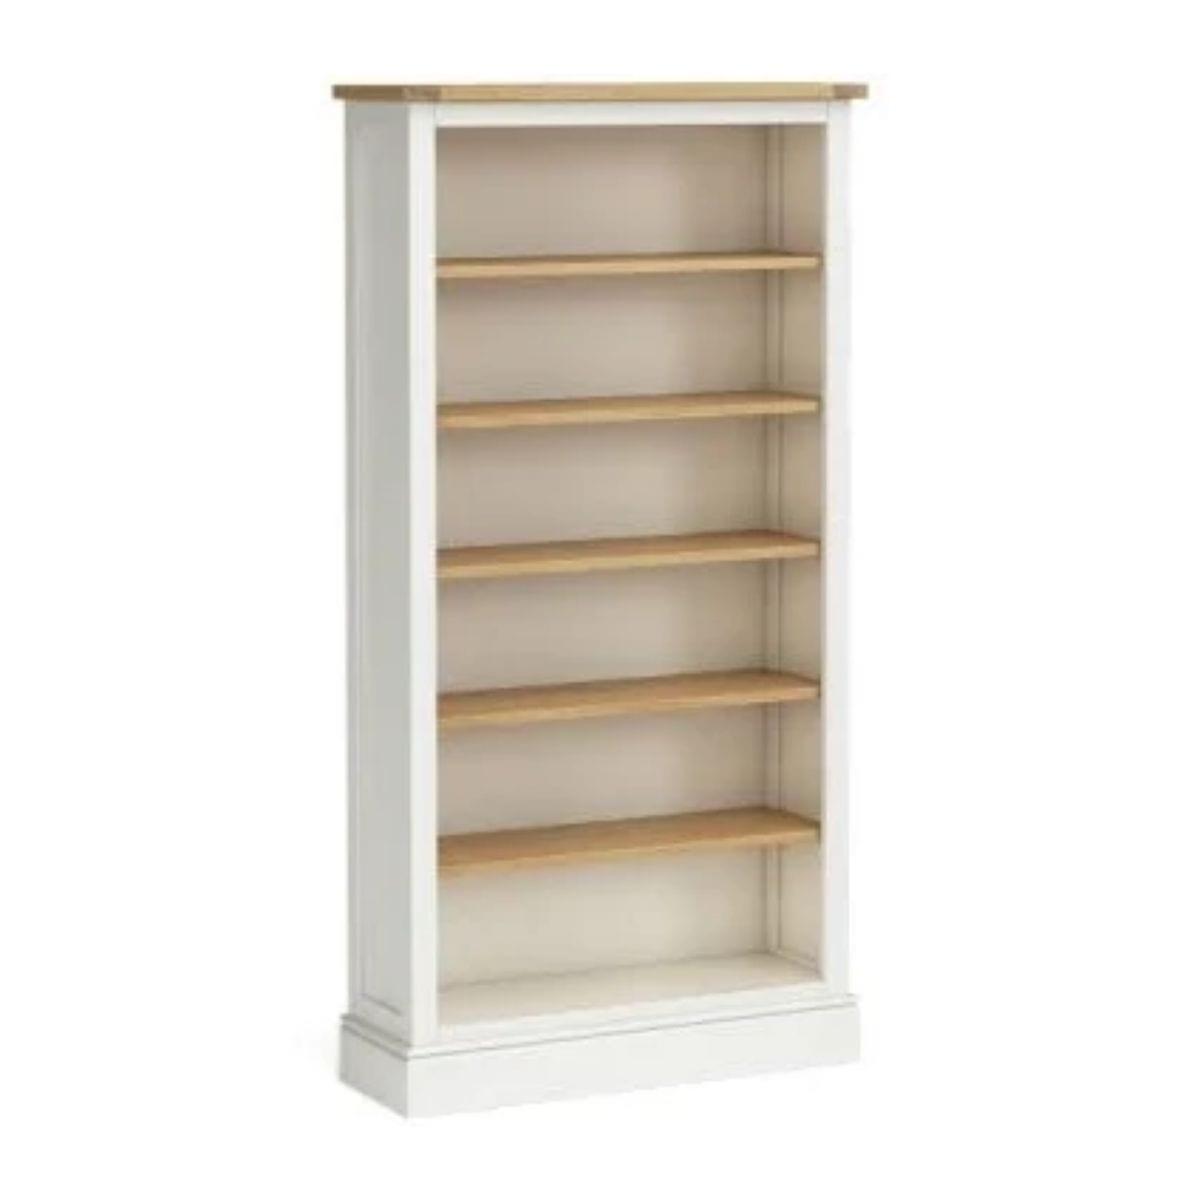 Ivory and Oak Bookcase